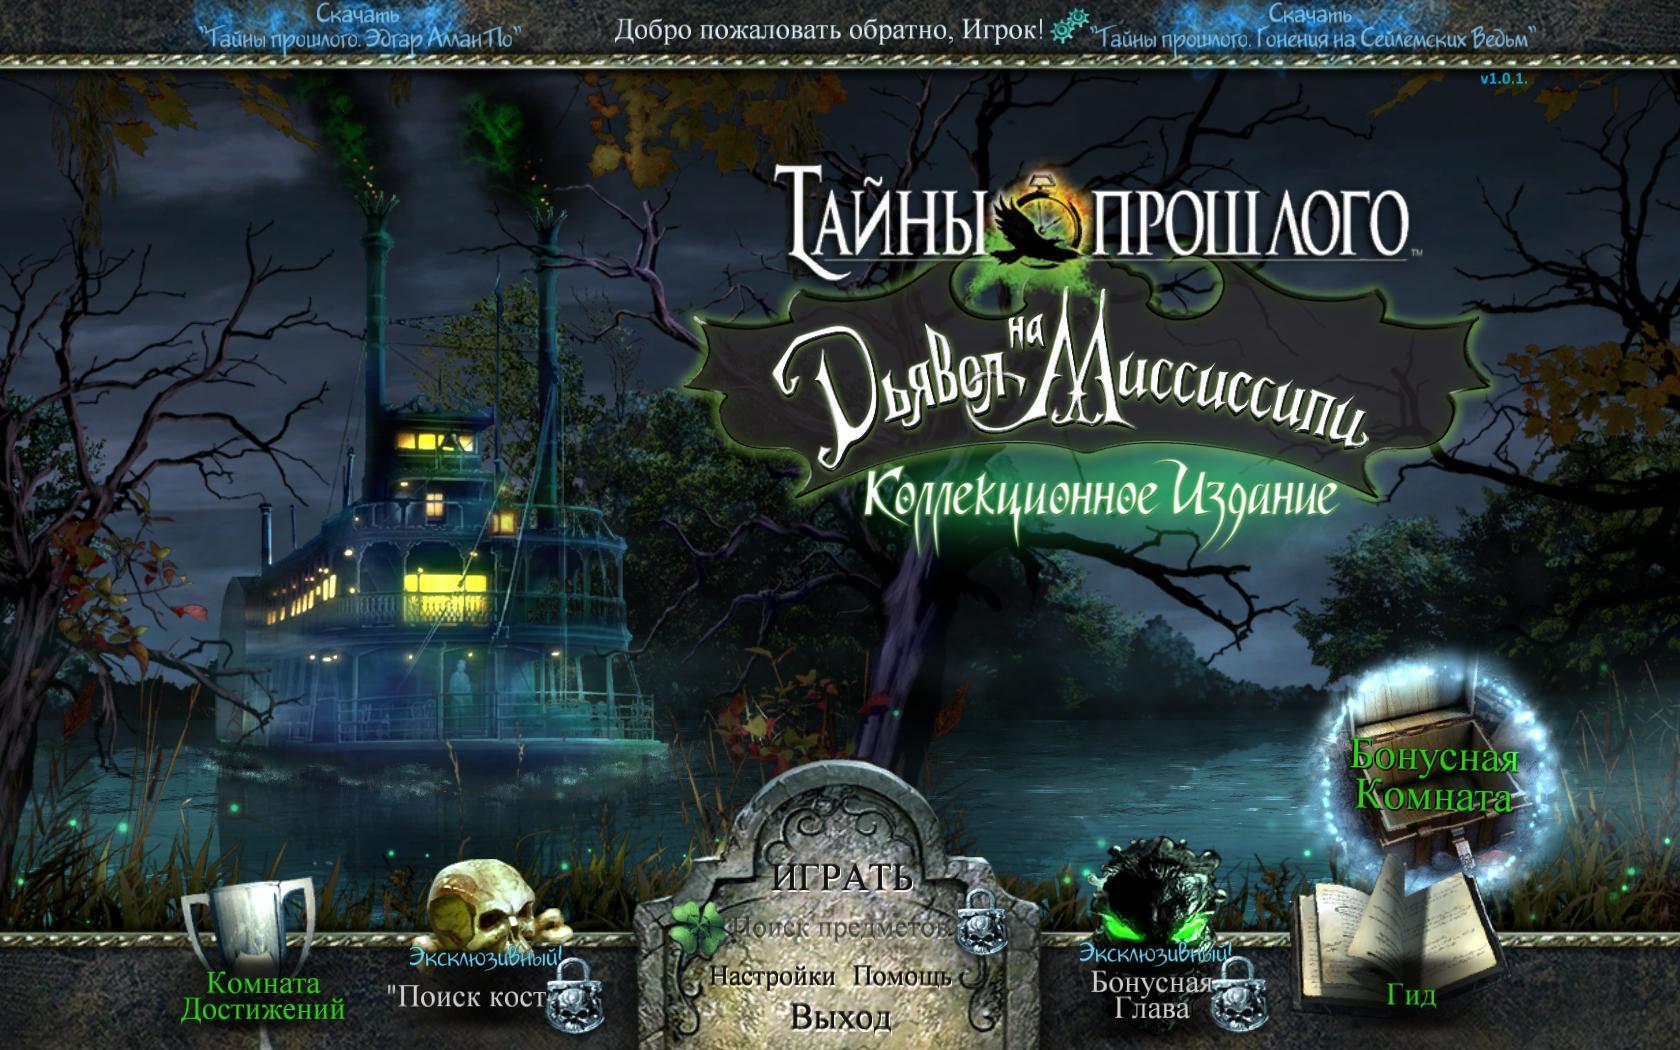 Тайны прошлого 3: Дьявол на Миссисипи. Коллекционное издание | Midnight Mysteries 3: Devil on the Mississippi CE (Rus)